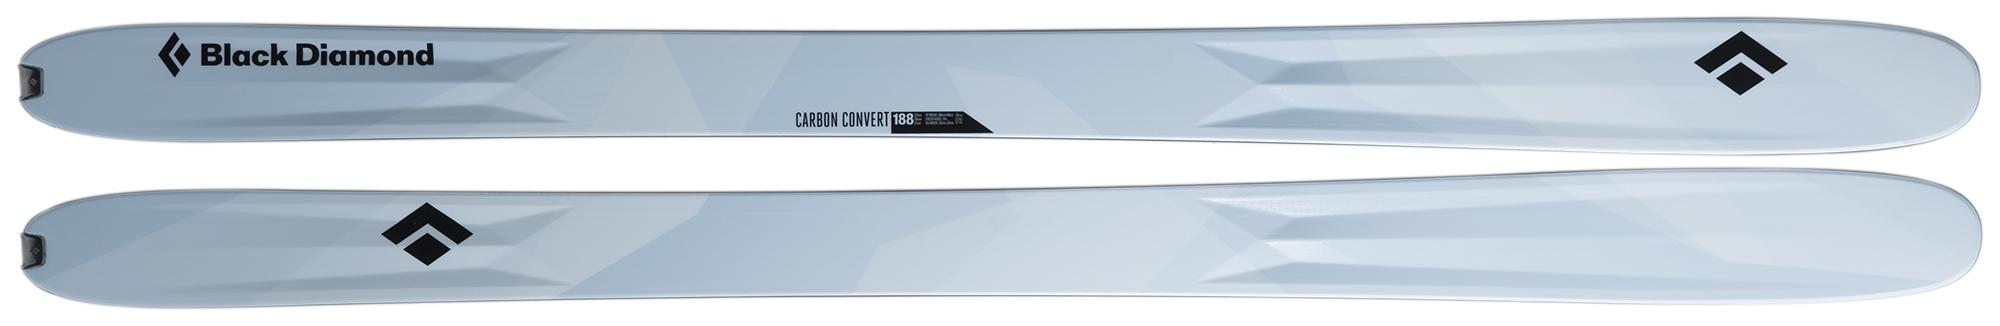 Black Diamond Carbon Convert